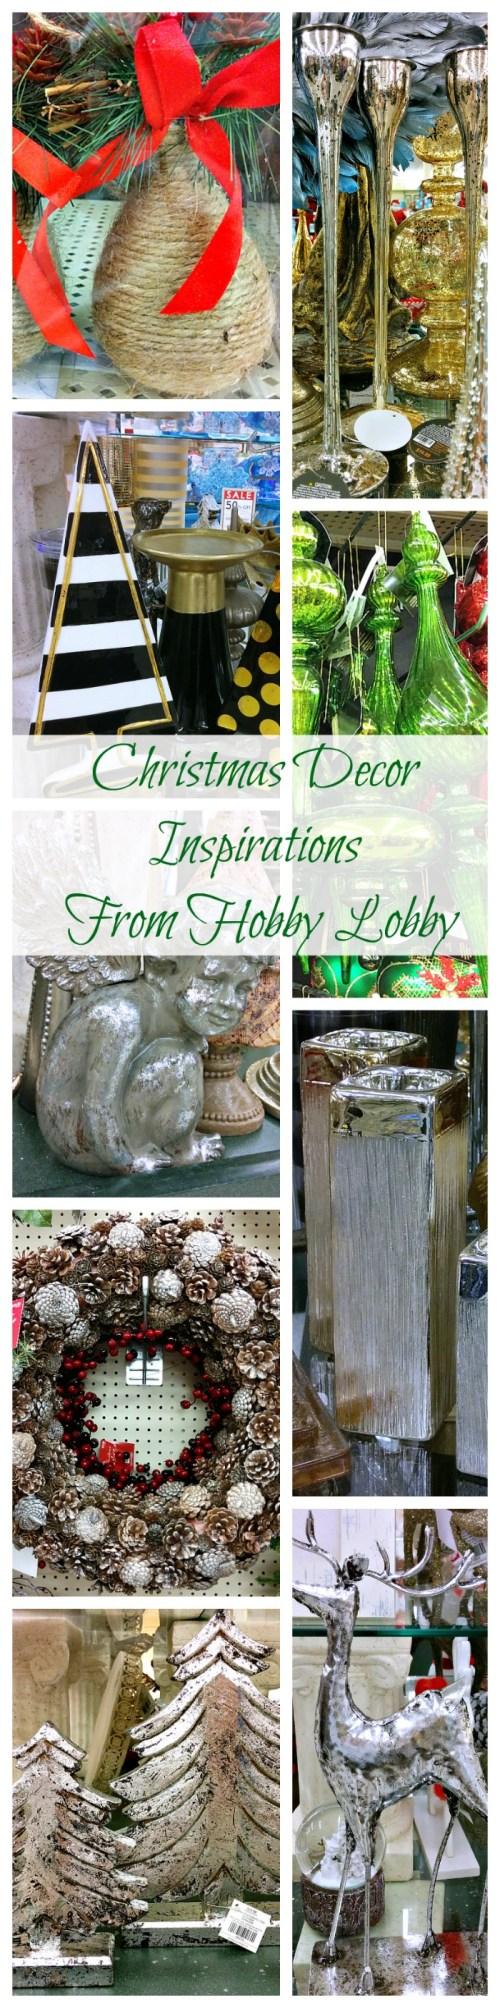 Medium Of Hobby Lobby Christmas Decorations